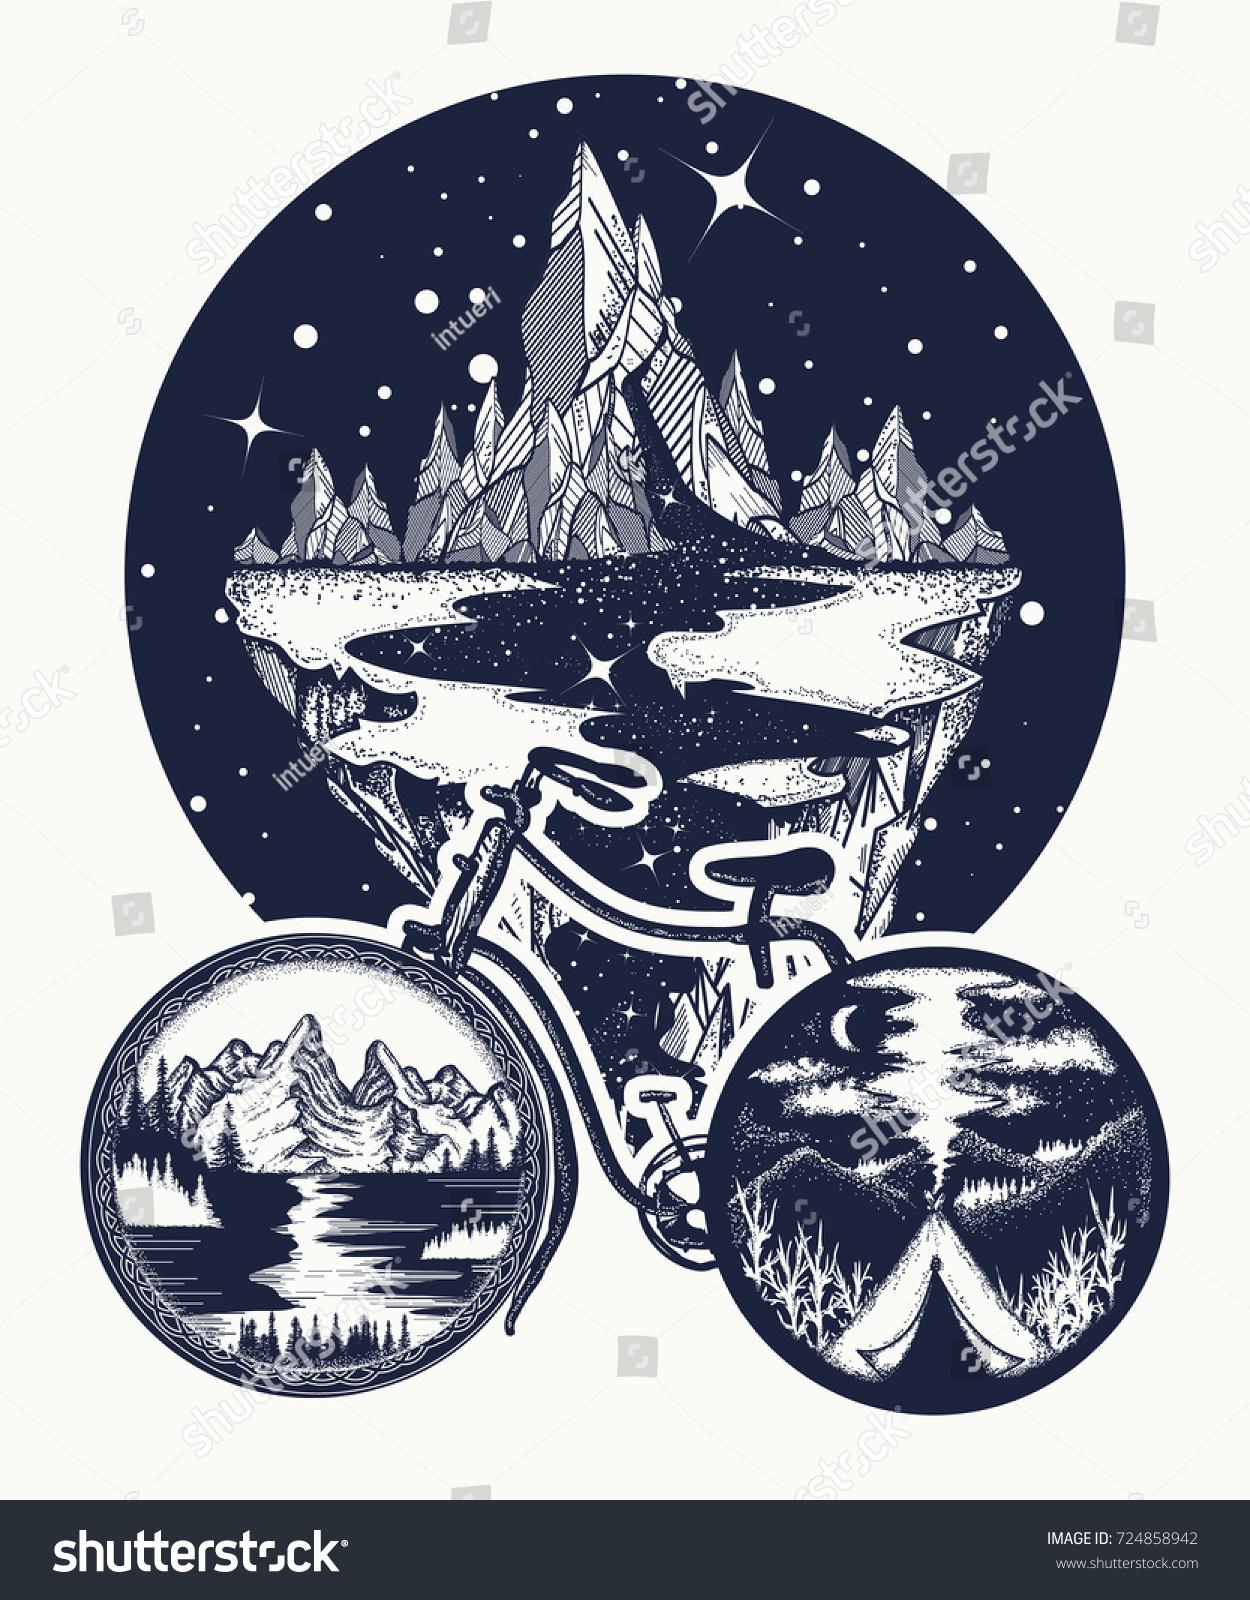 Outdoors tattoo tshirt design bicycle tattoo stock vector outdoors tattoo and t shirt design bicycle tattoo art symbol of travel biocorpaavc Images